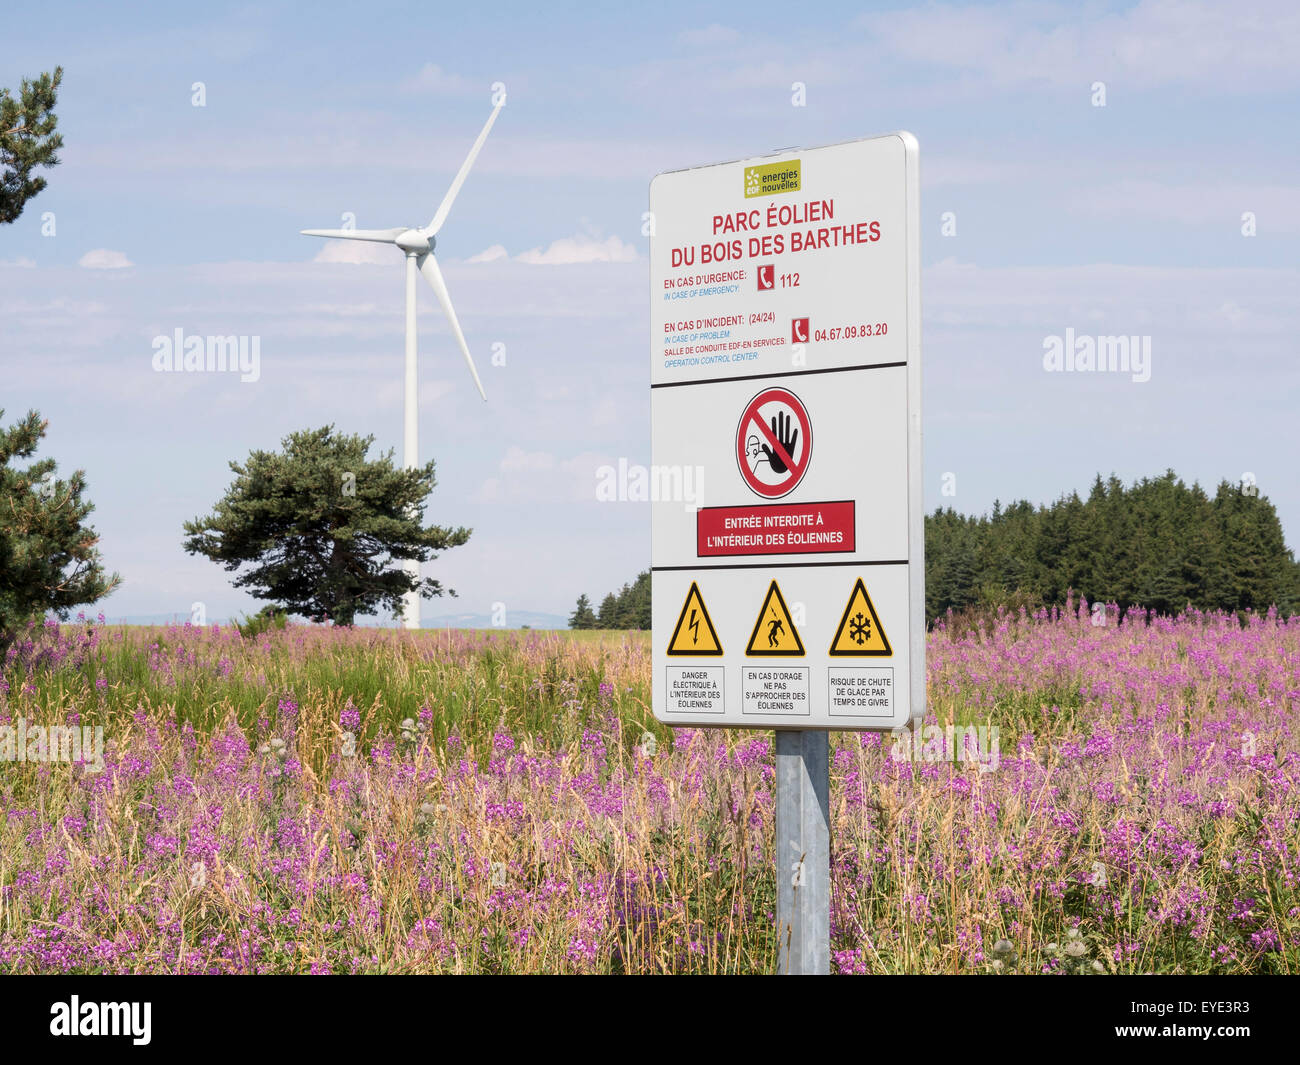 Barthes wind farm. Information board Hazards - Stock Image